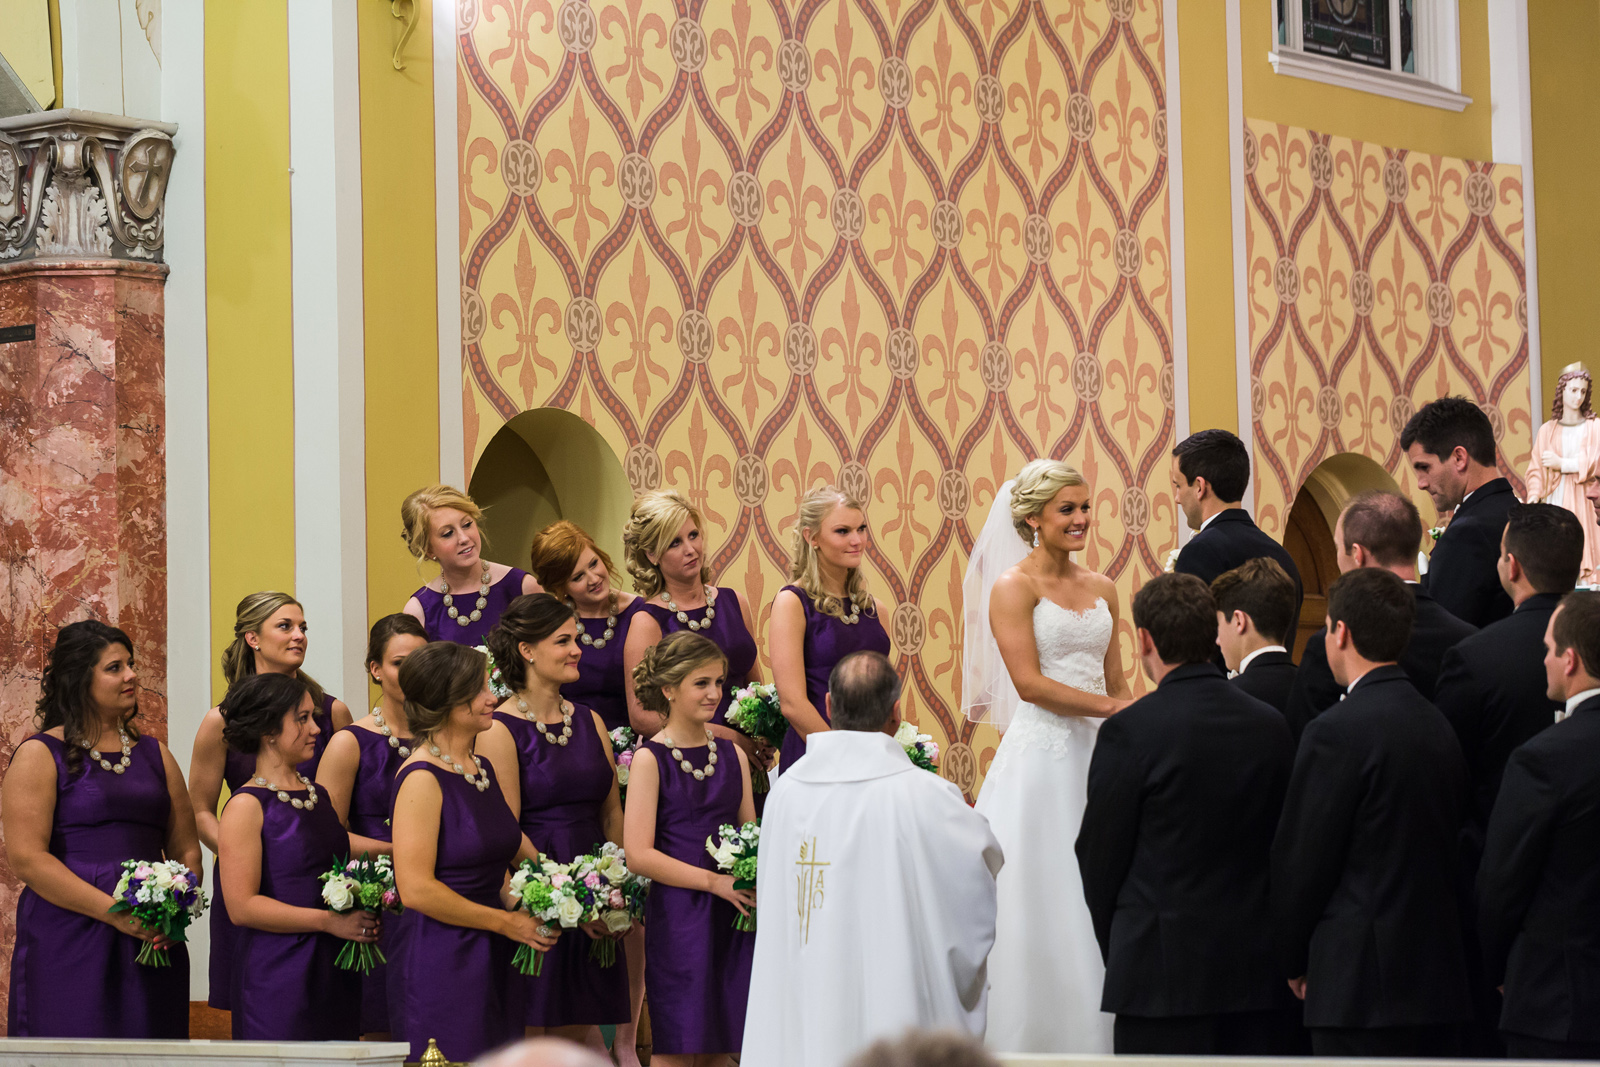 St Ambrose Hll Wedding_20141115_15183400.jpg